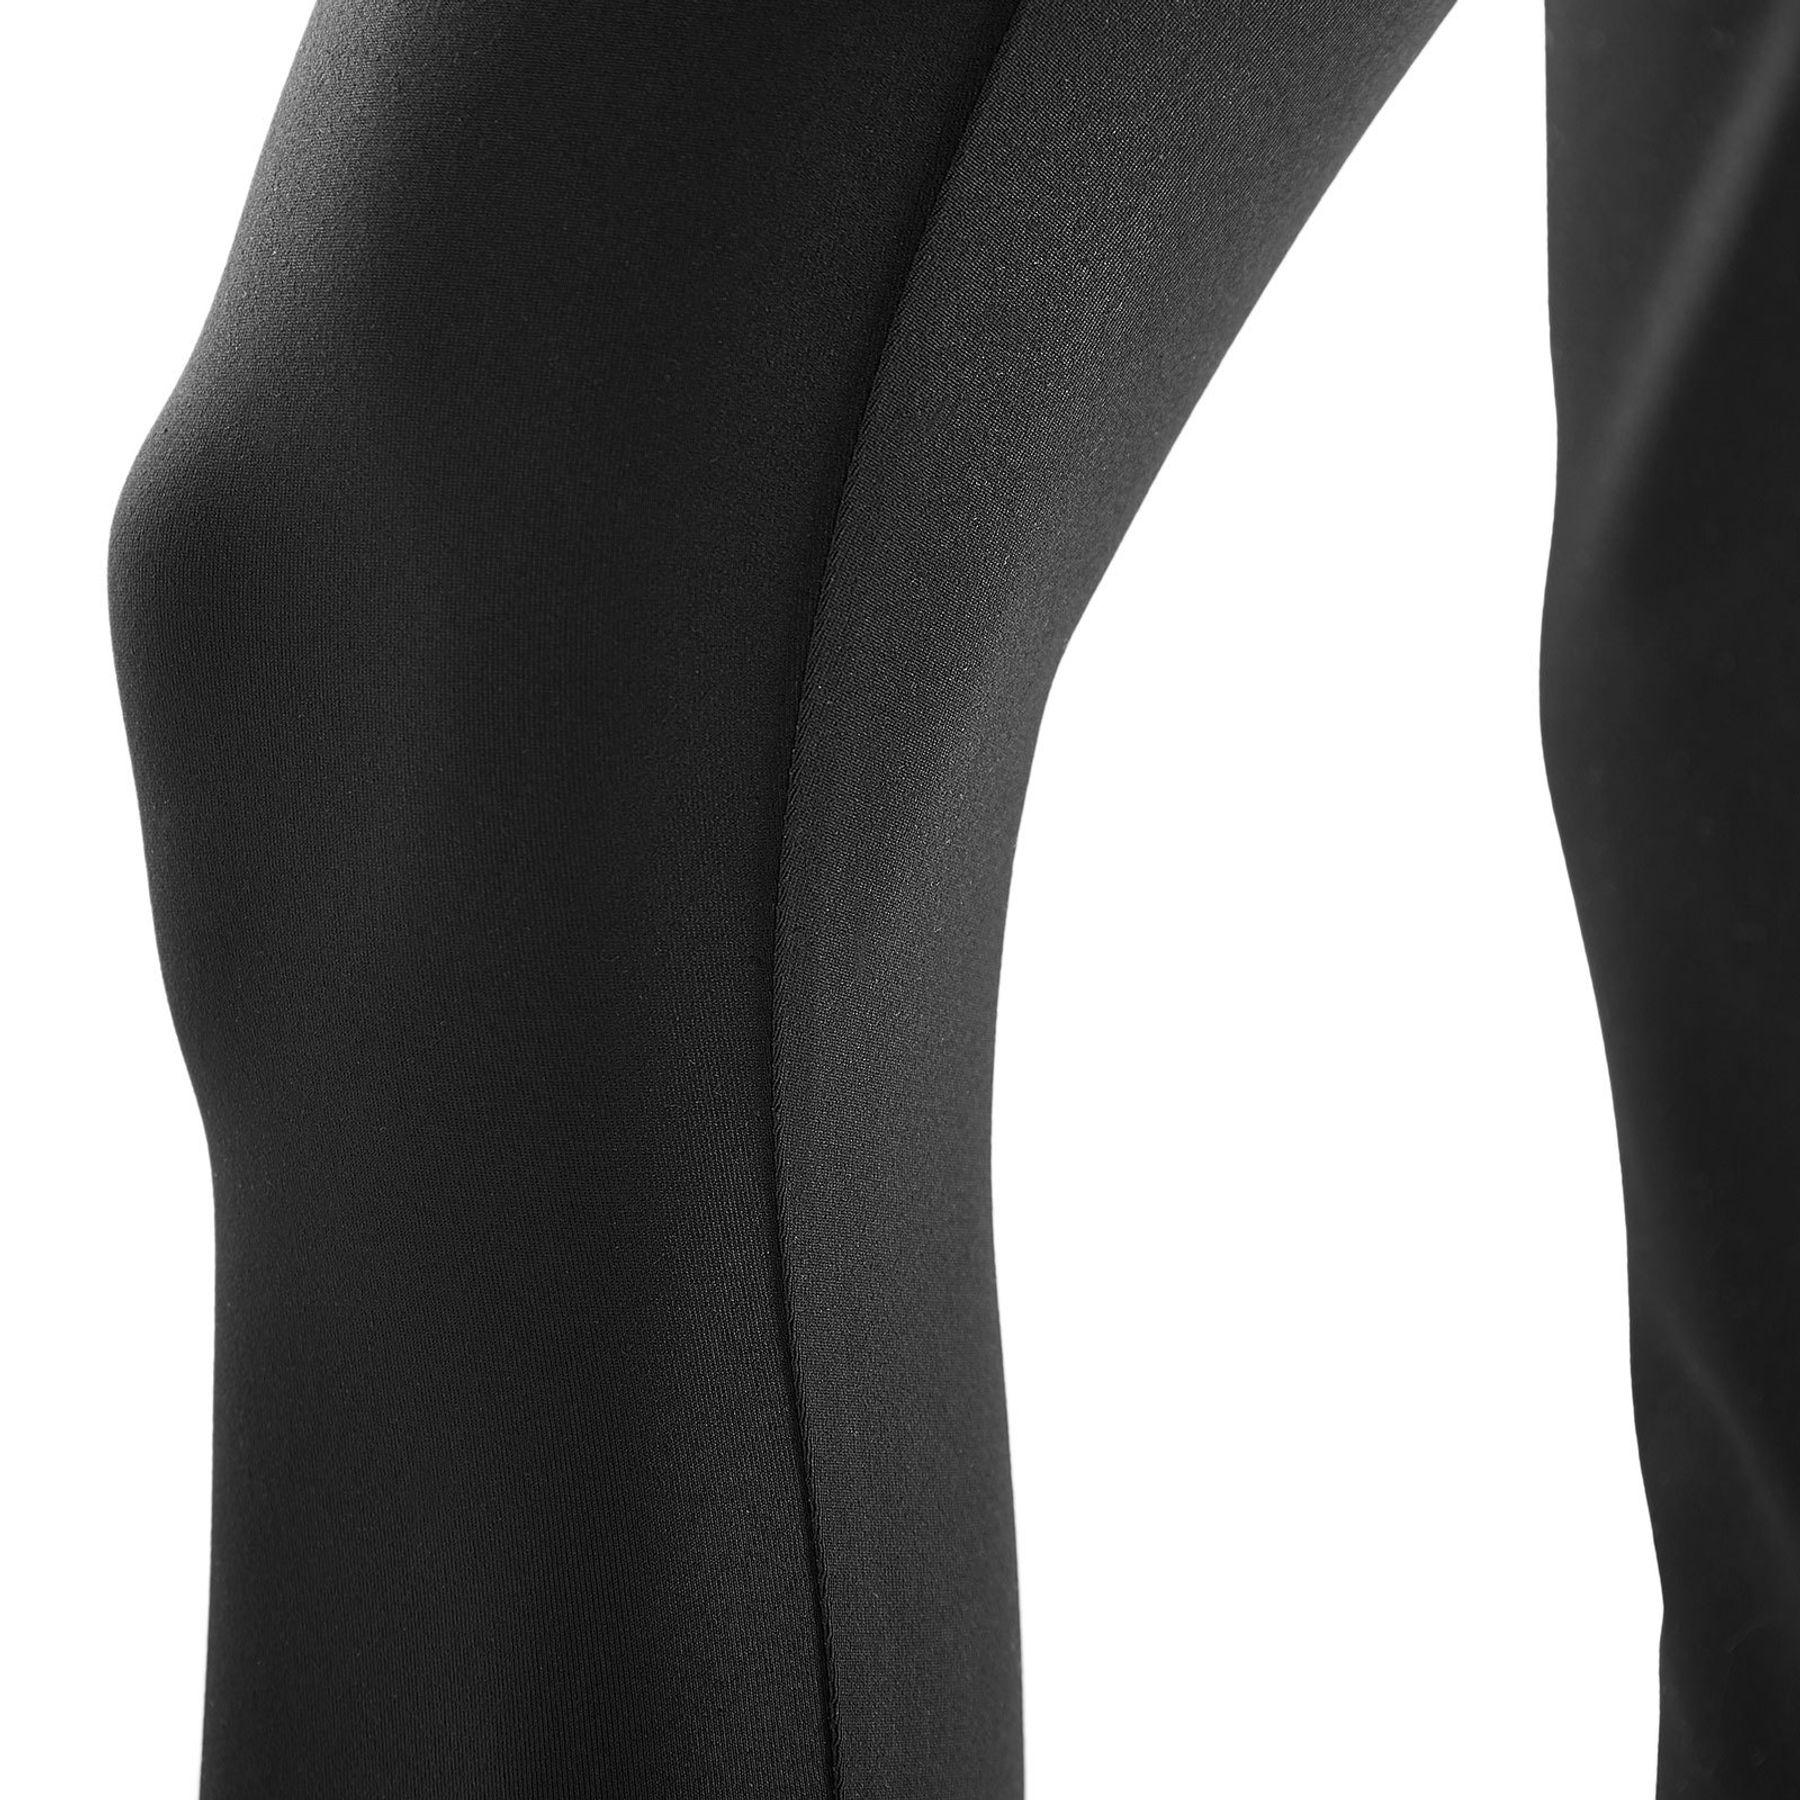 Joy - Bodyfit - Damen 3/4 Hose mit Shaping-Effekt, Sigrid (34507) – Bild 6